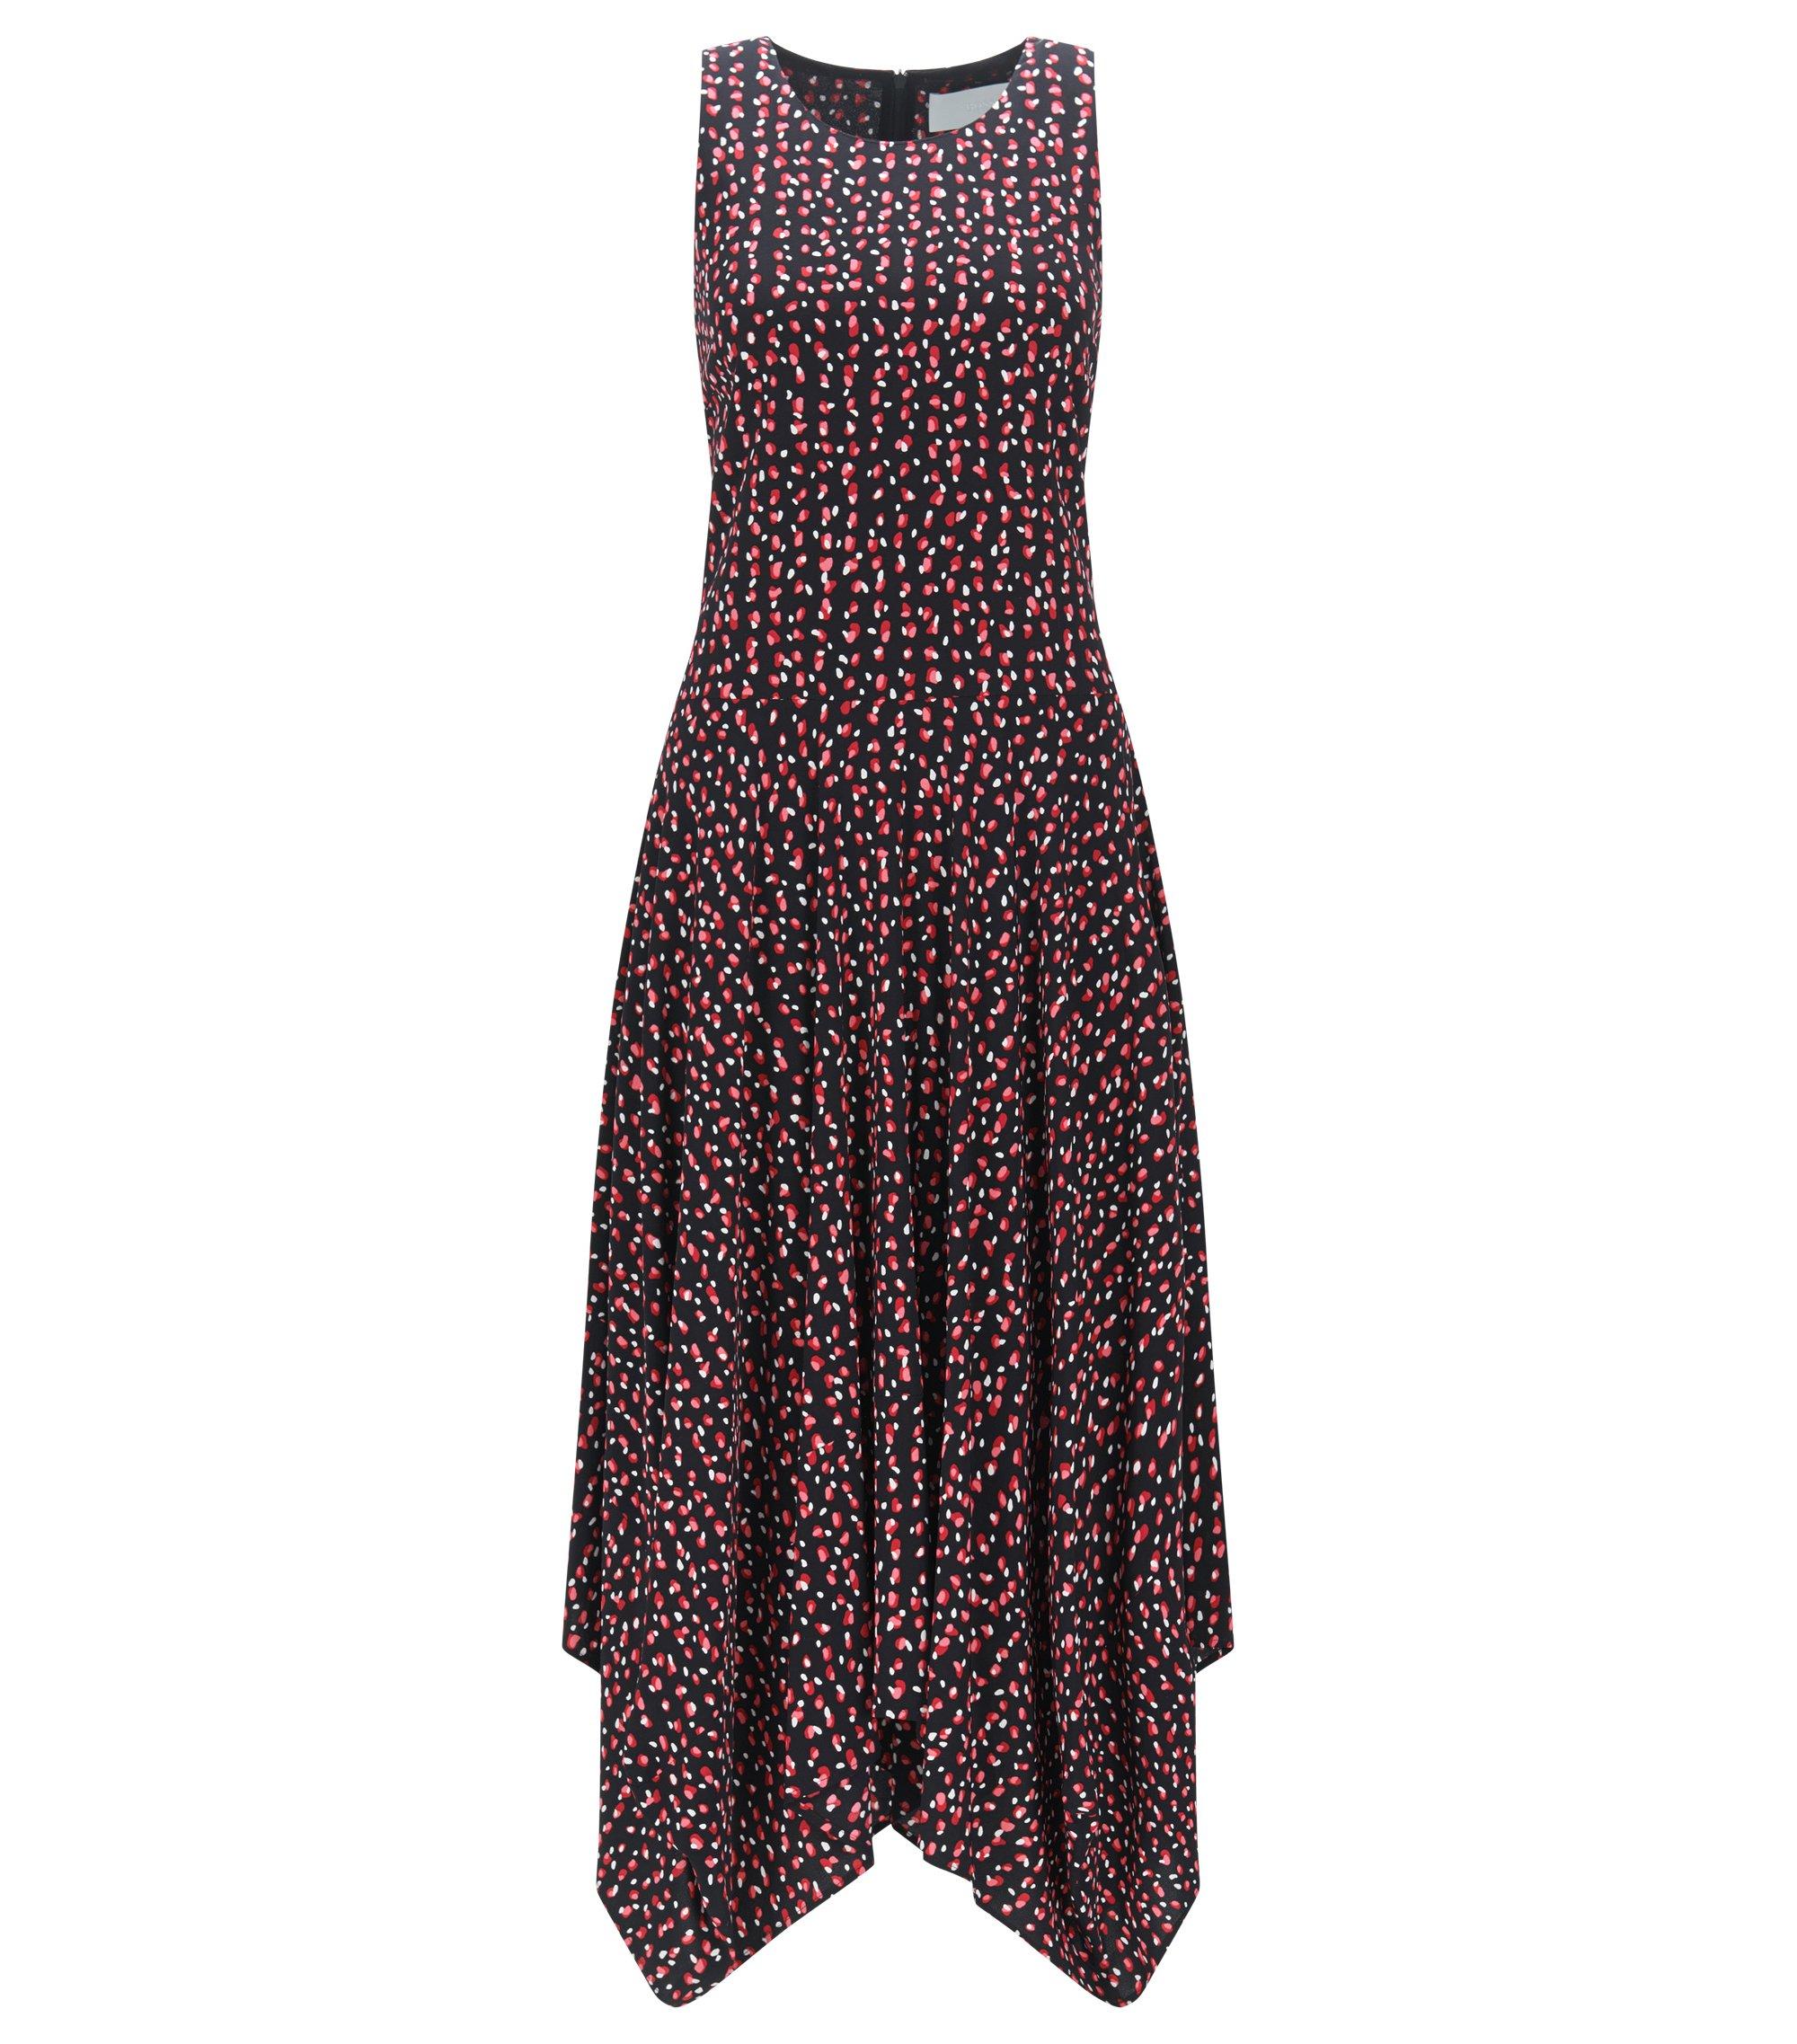 Relaxed-Fit Kleid aus softem Crêpe-Gewebe mit Print, Gemustert